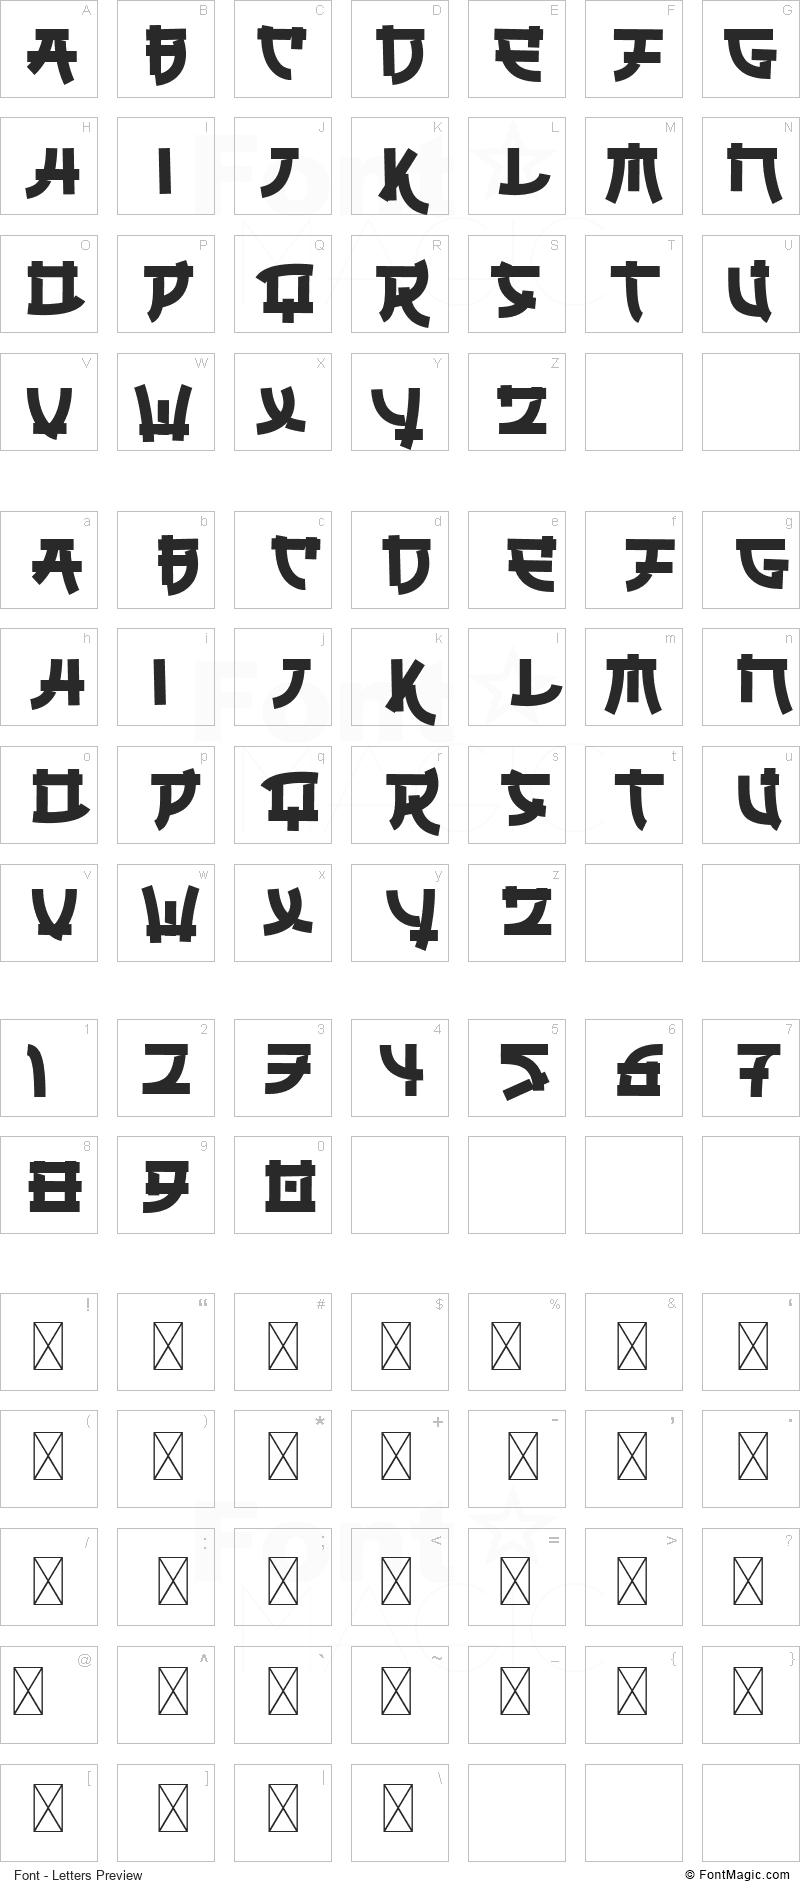 Ungai Font - All Latters Preview Chart